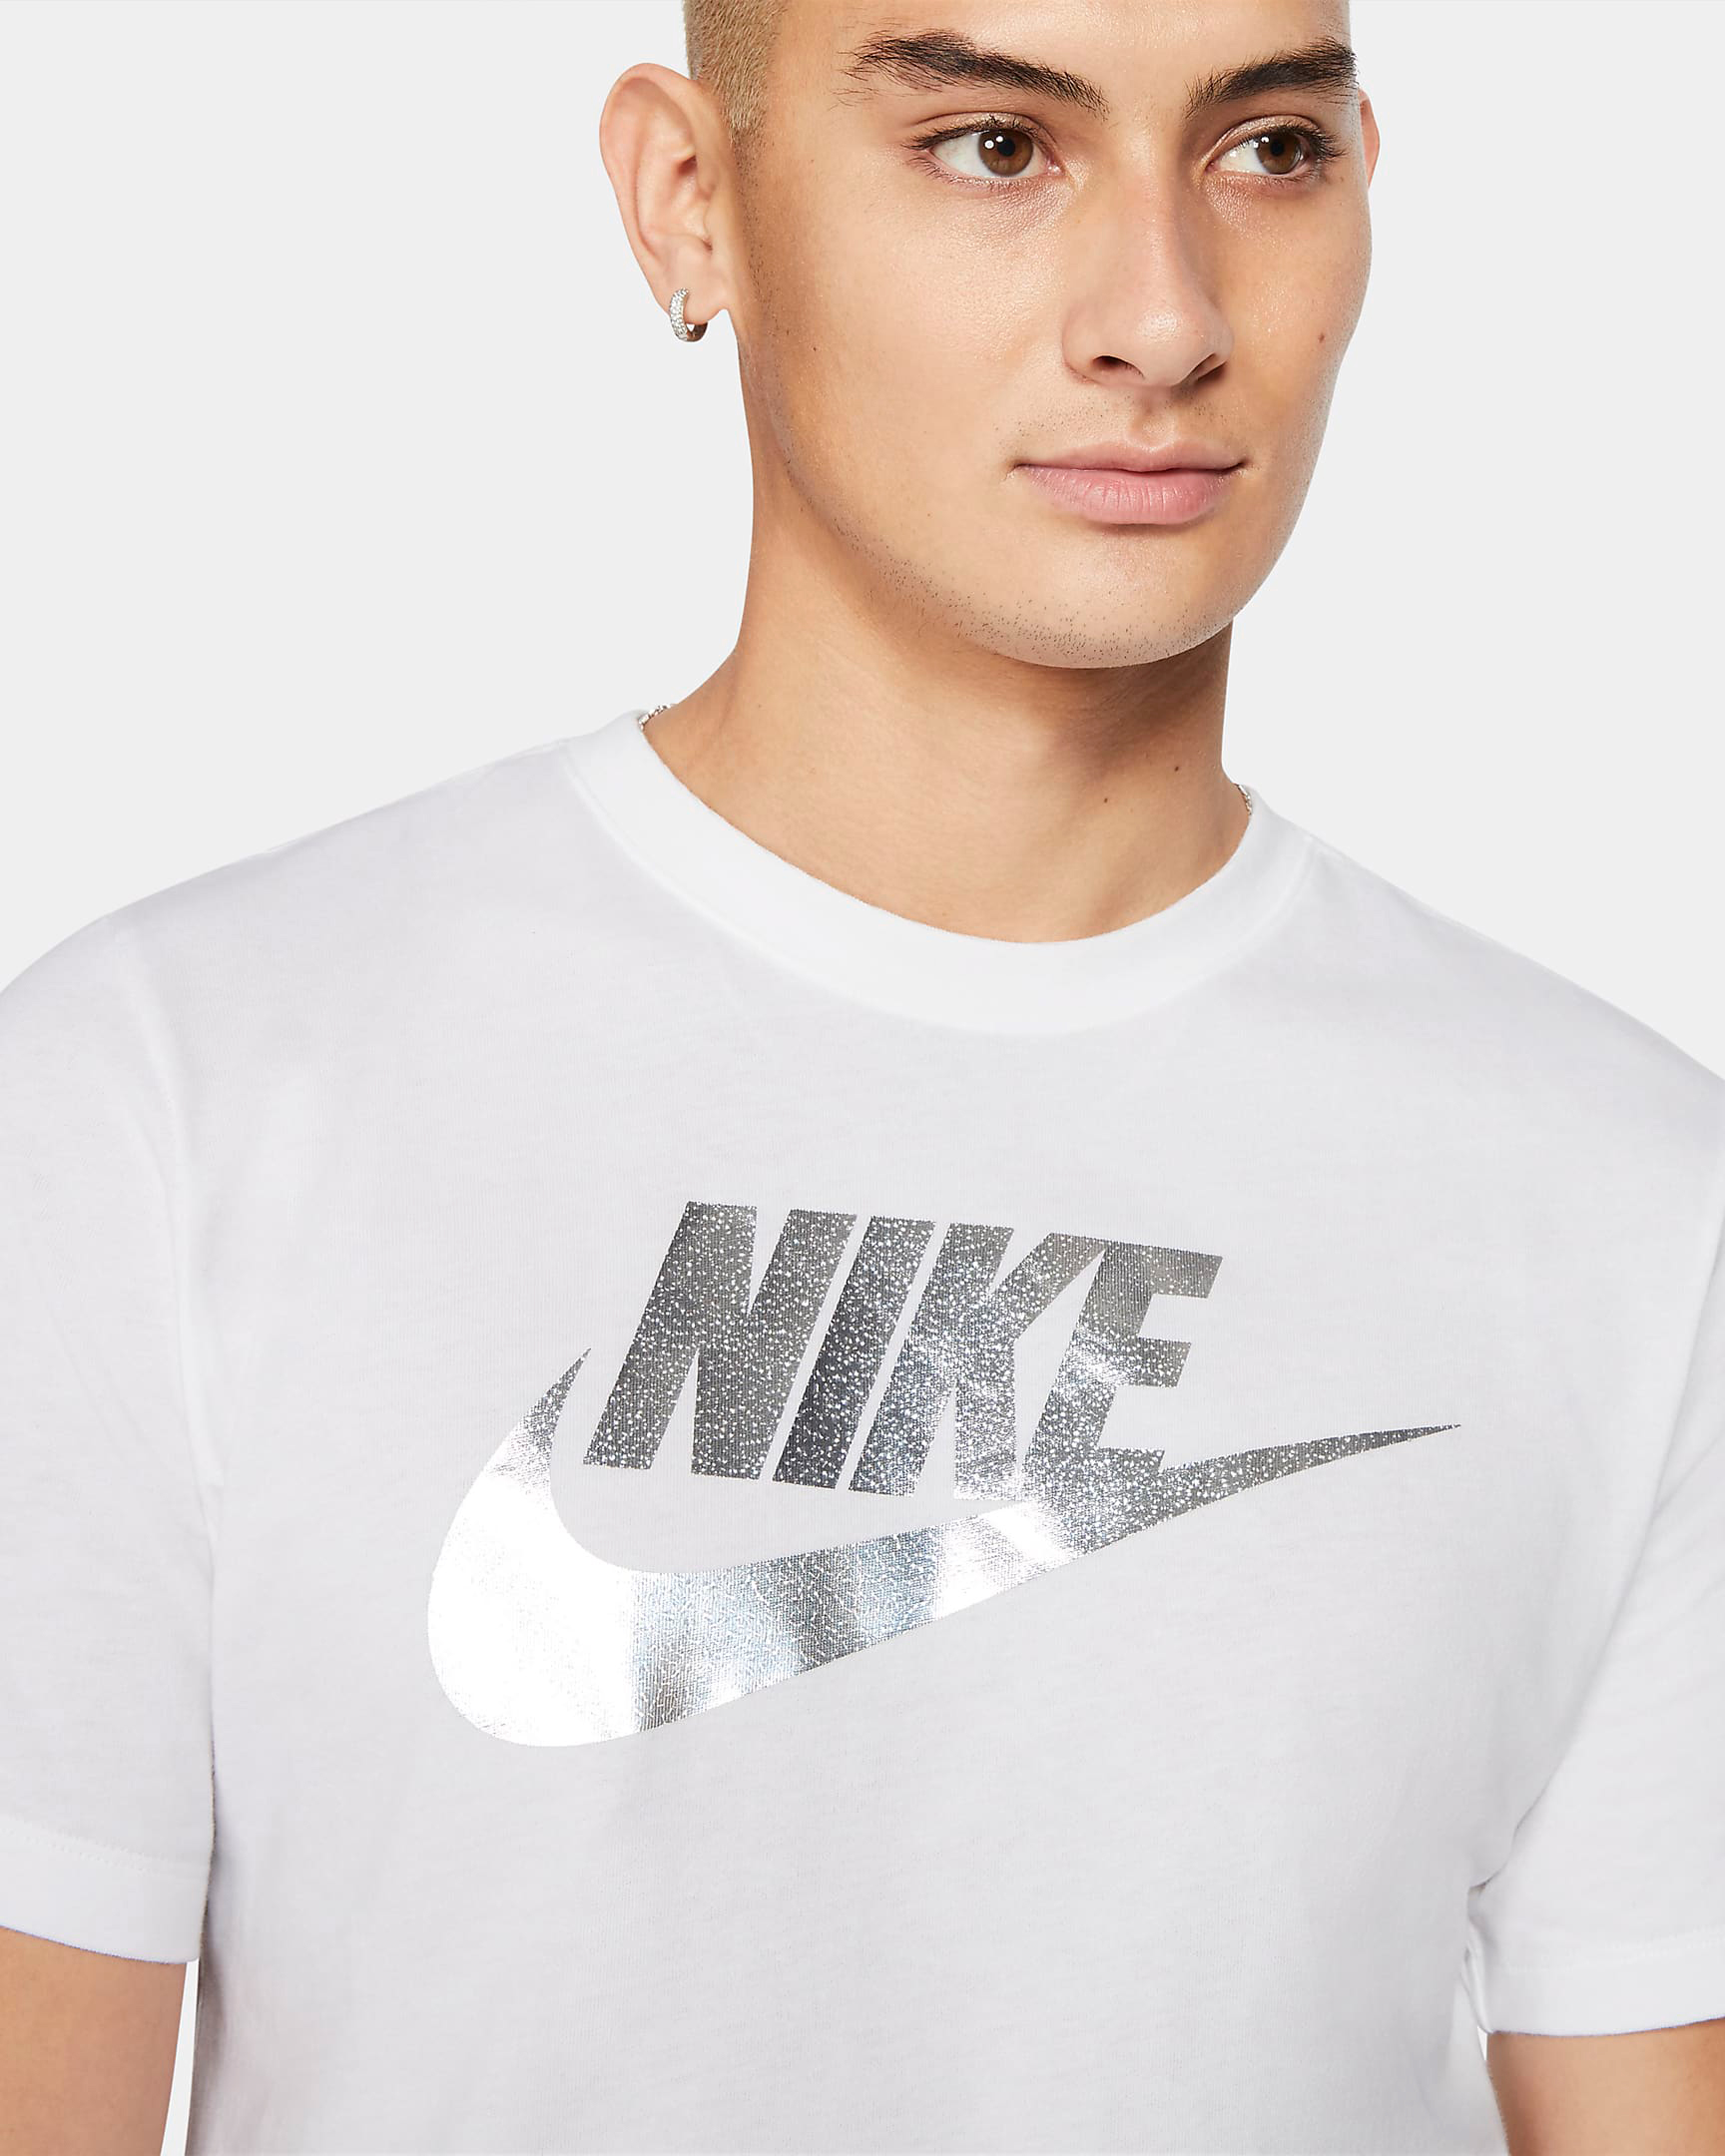 nike-sportswear-metallic-silver-shirt-white-1